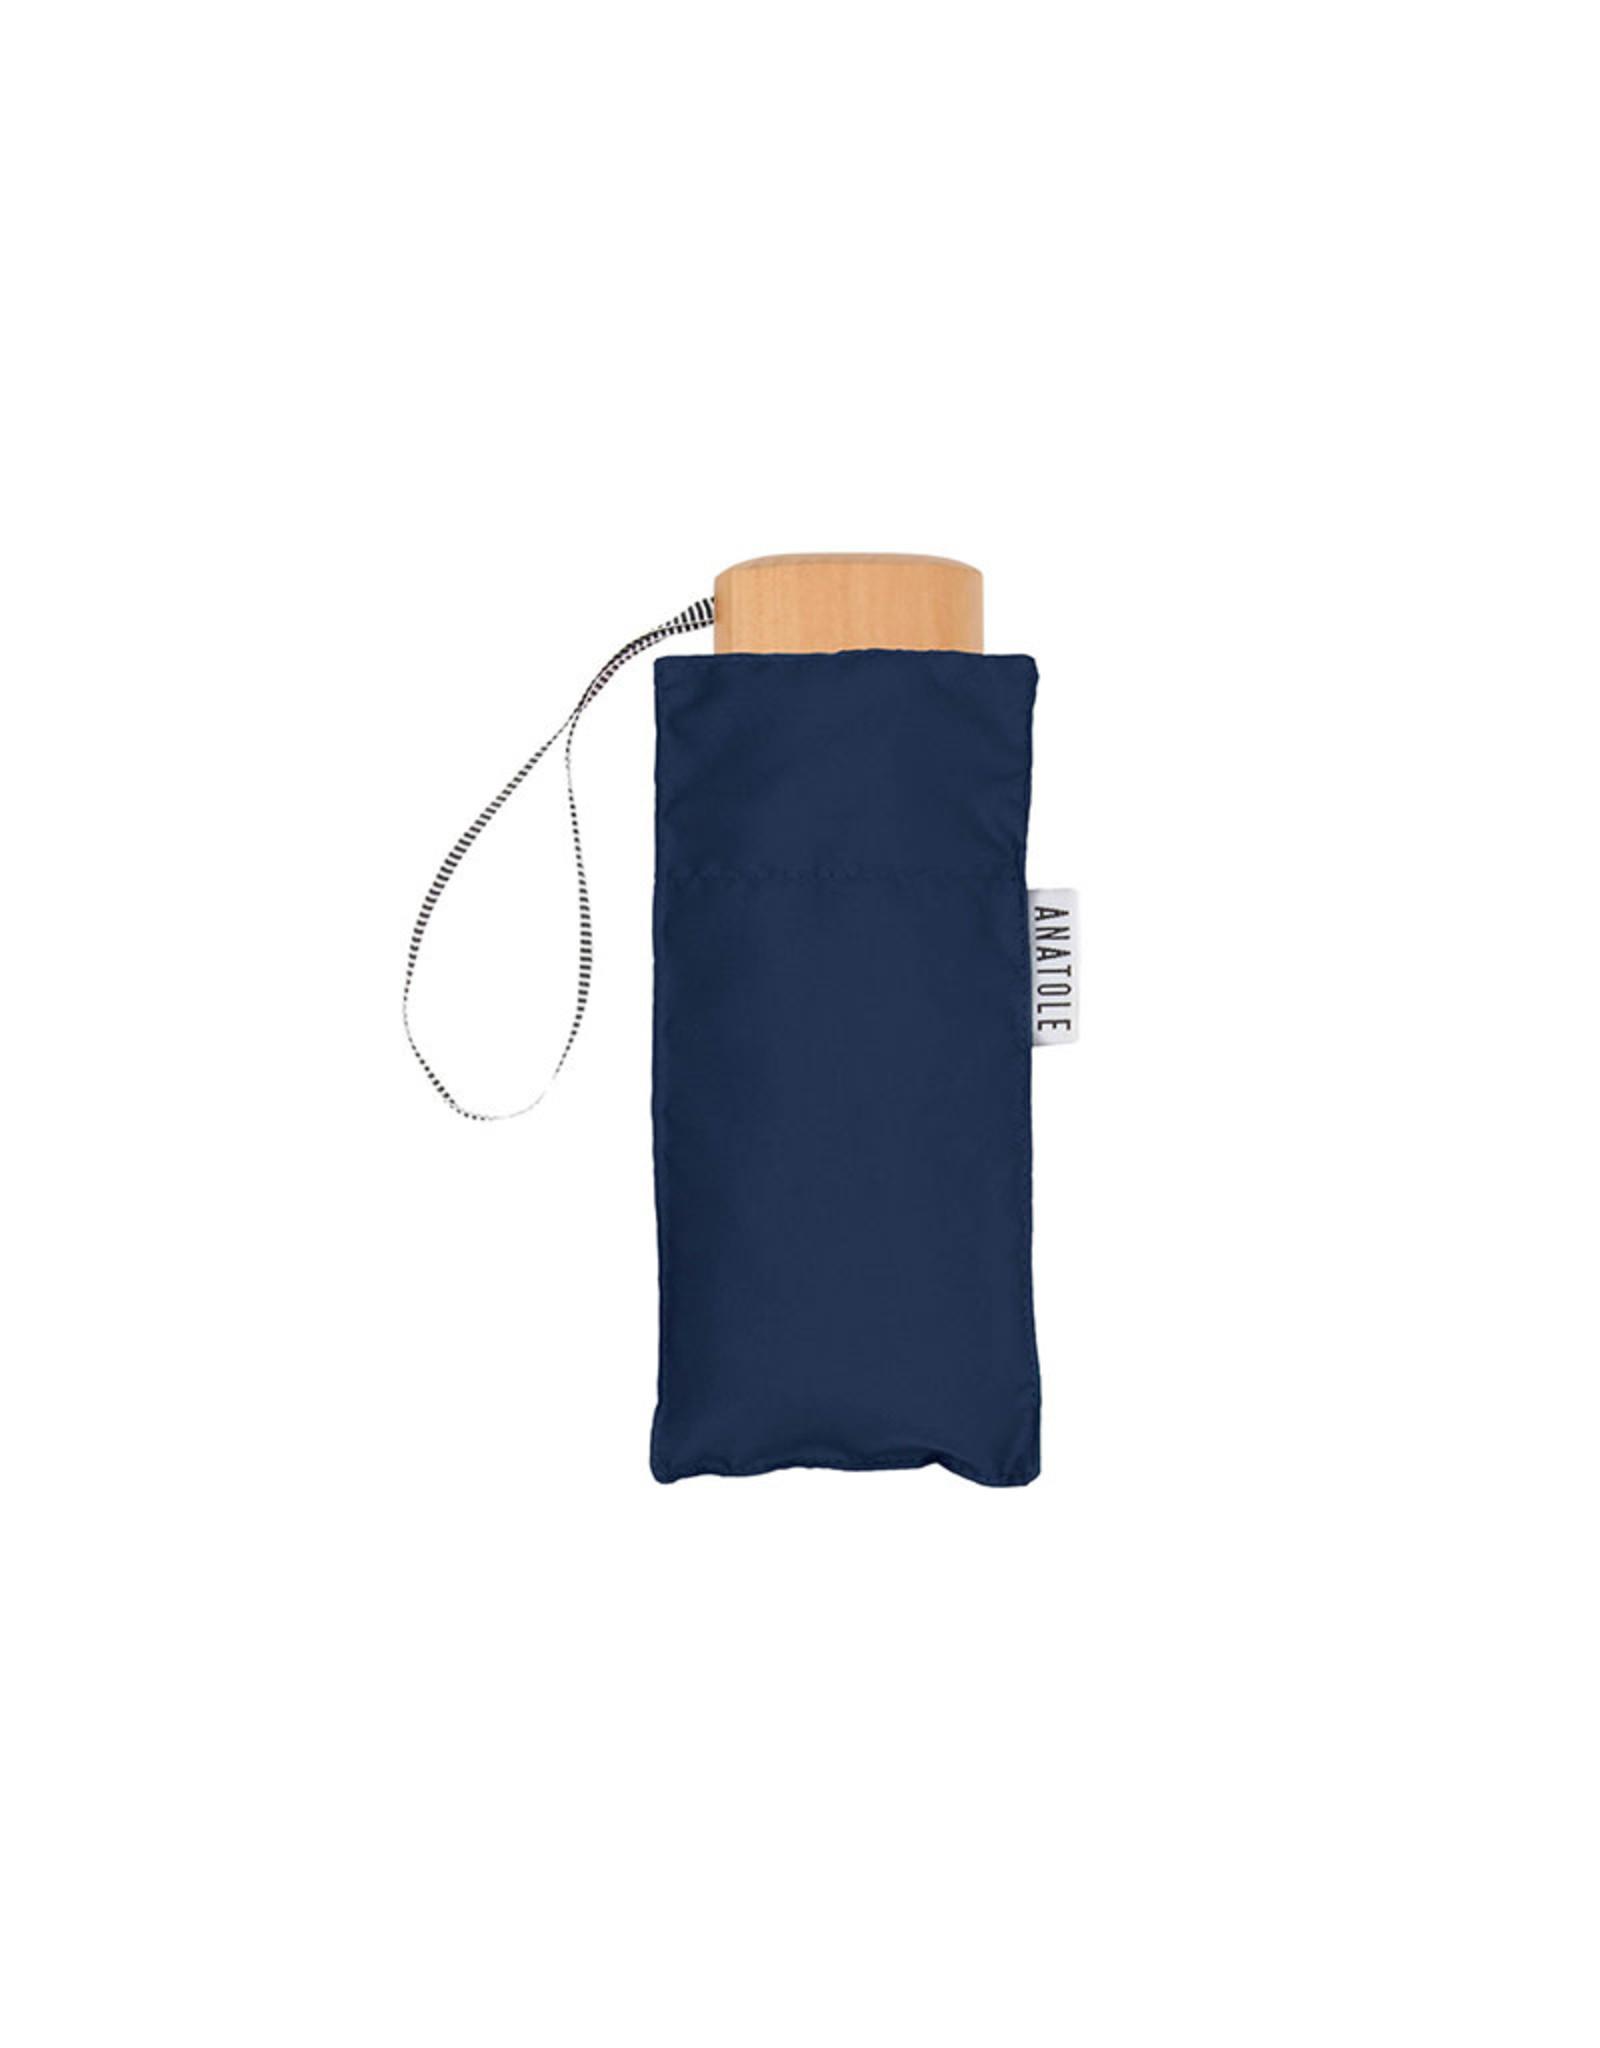 ANATOLE ANATOLE Folding Umbrella - Colette - Navy Blue